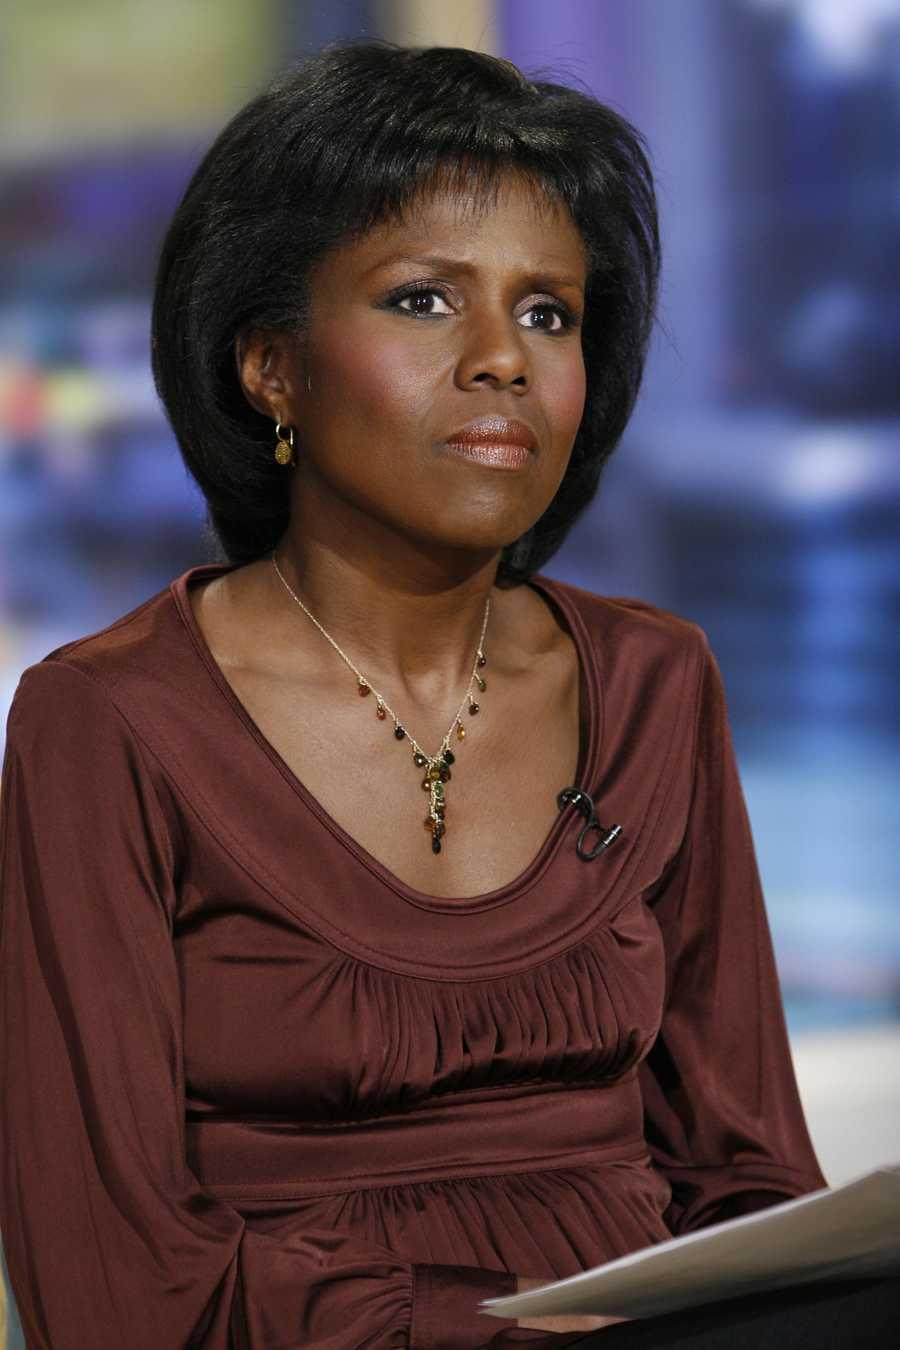 10) Deborah - 969  (Pictured here is Deborah Roberts from ABC Nightline)